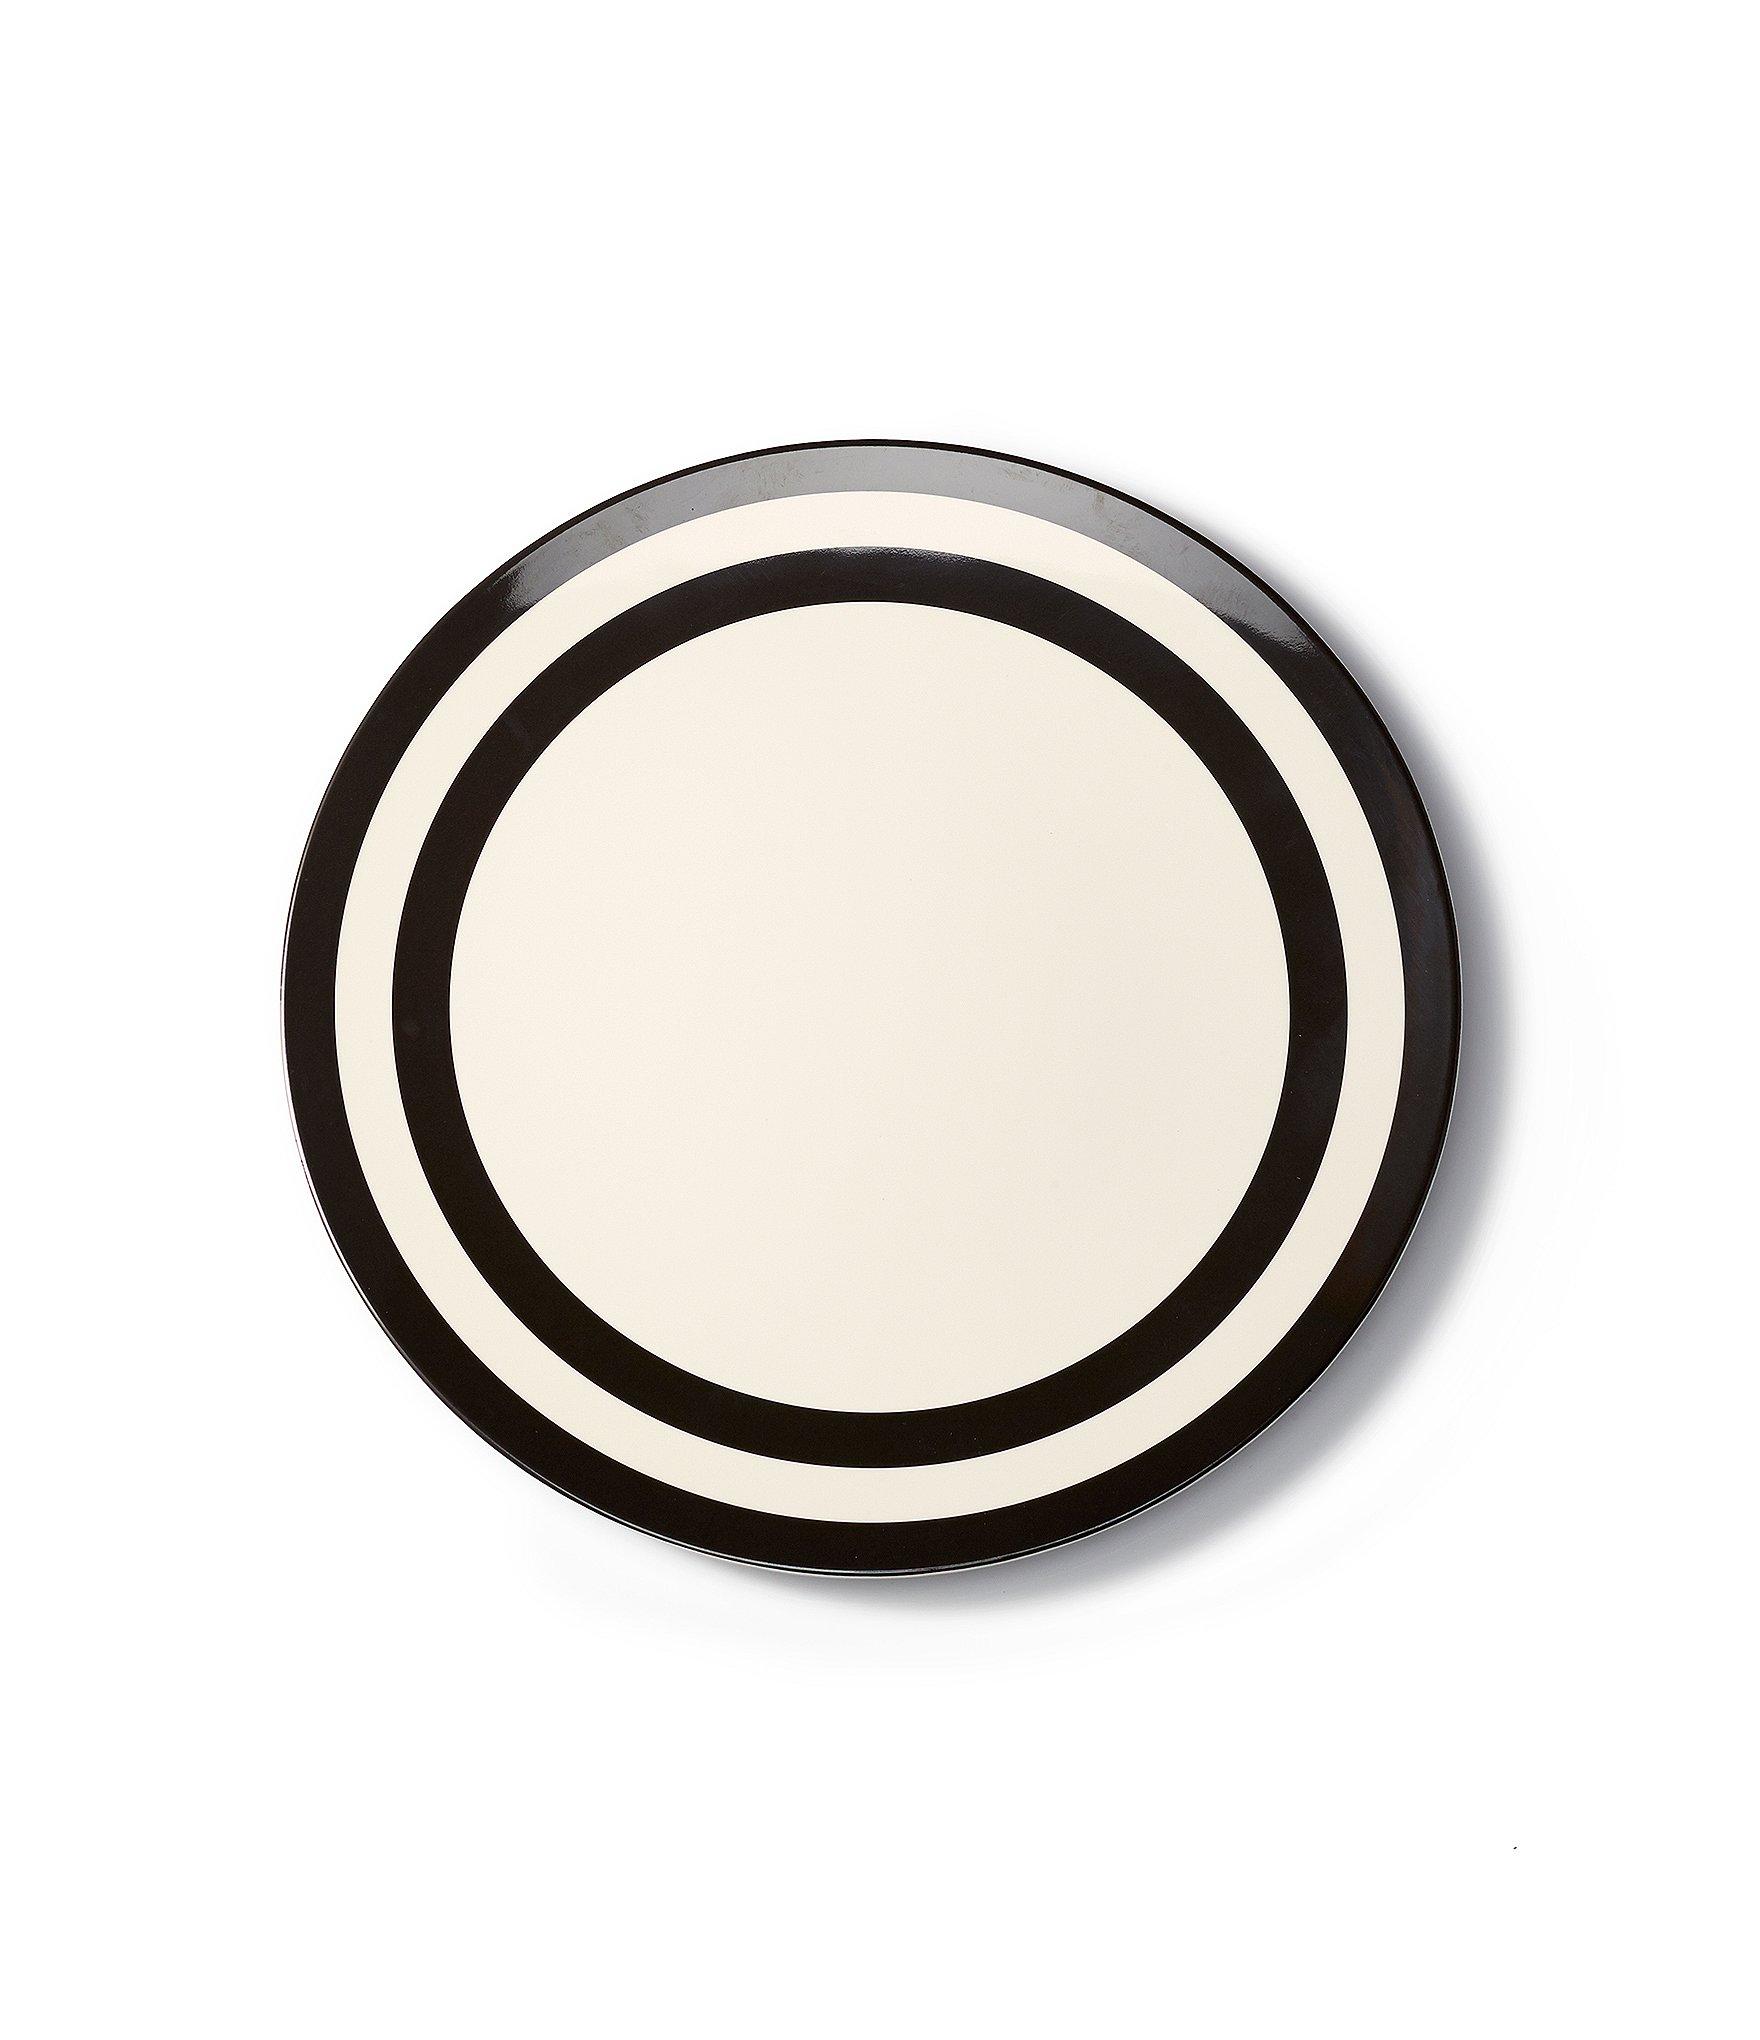 kate spade new york Casual Everyday Dinnerware Plates  Dishes \u0026 Sets | Dillards  sc 1 st  Dillard\u0027s & kate spade new york Casual Everyday Dinnerware: Plates  Dishes ...